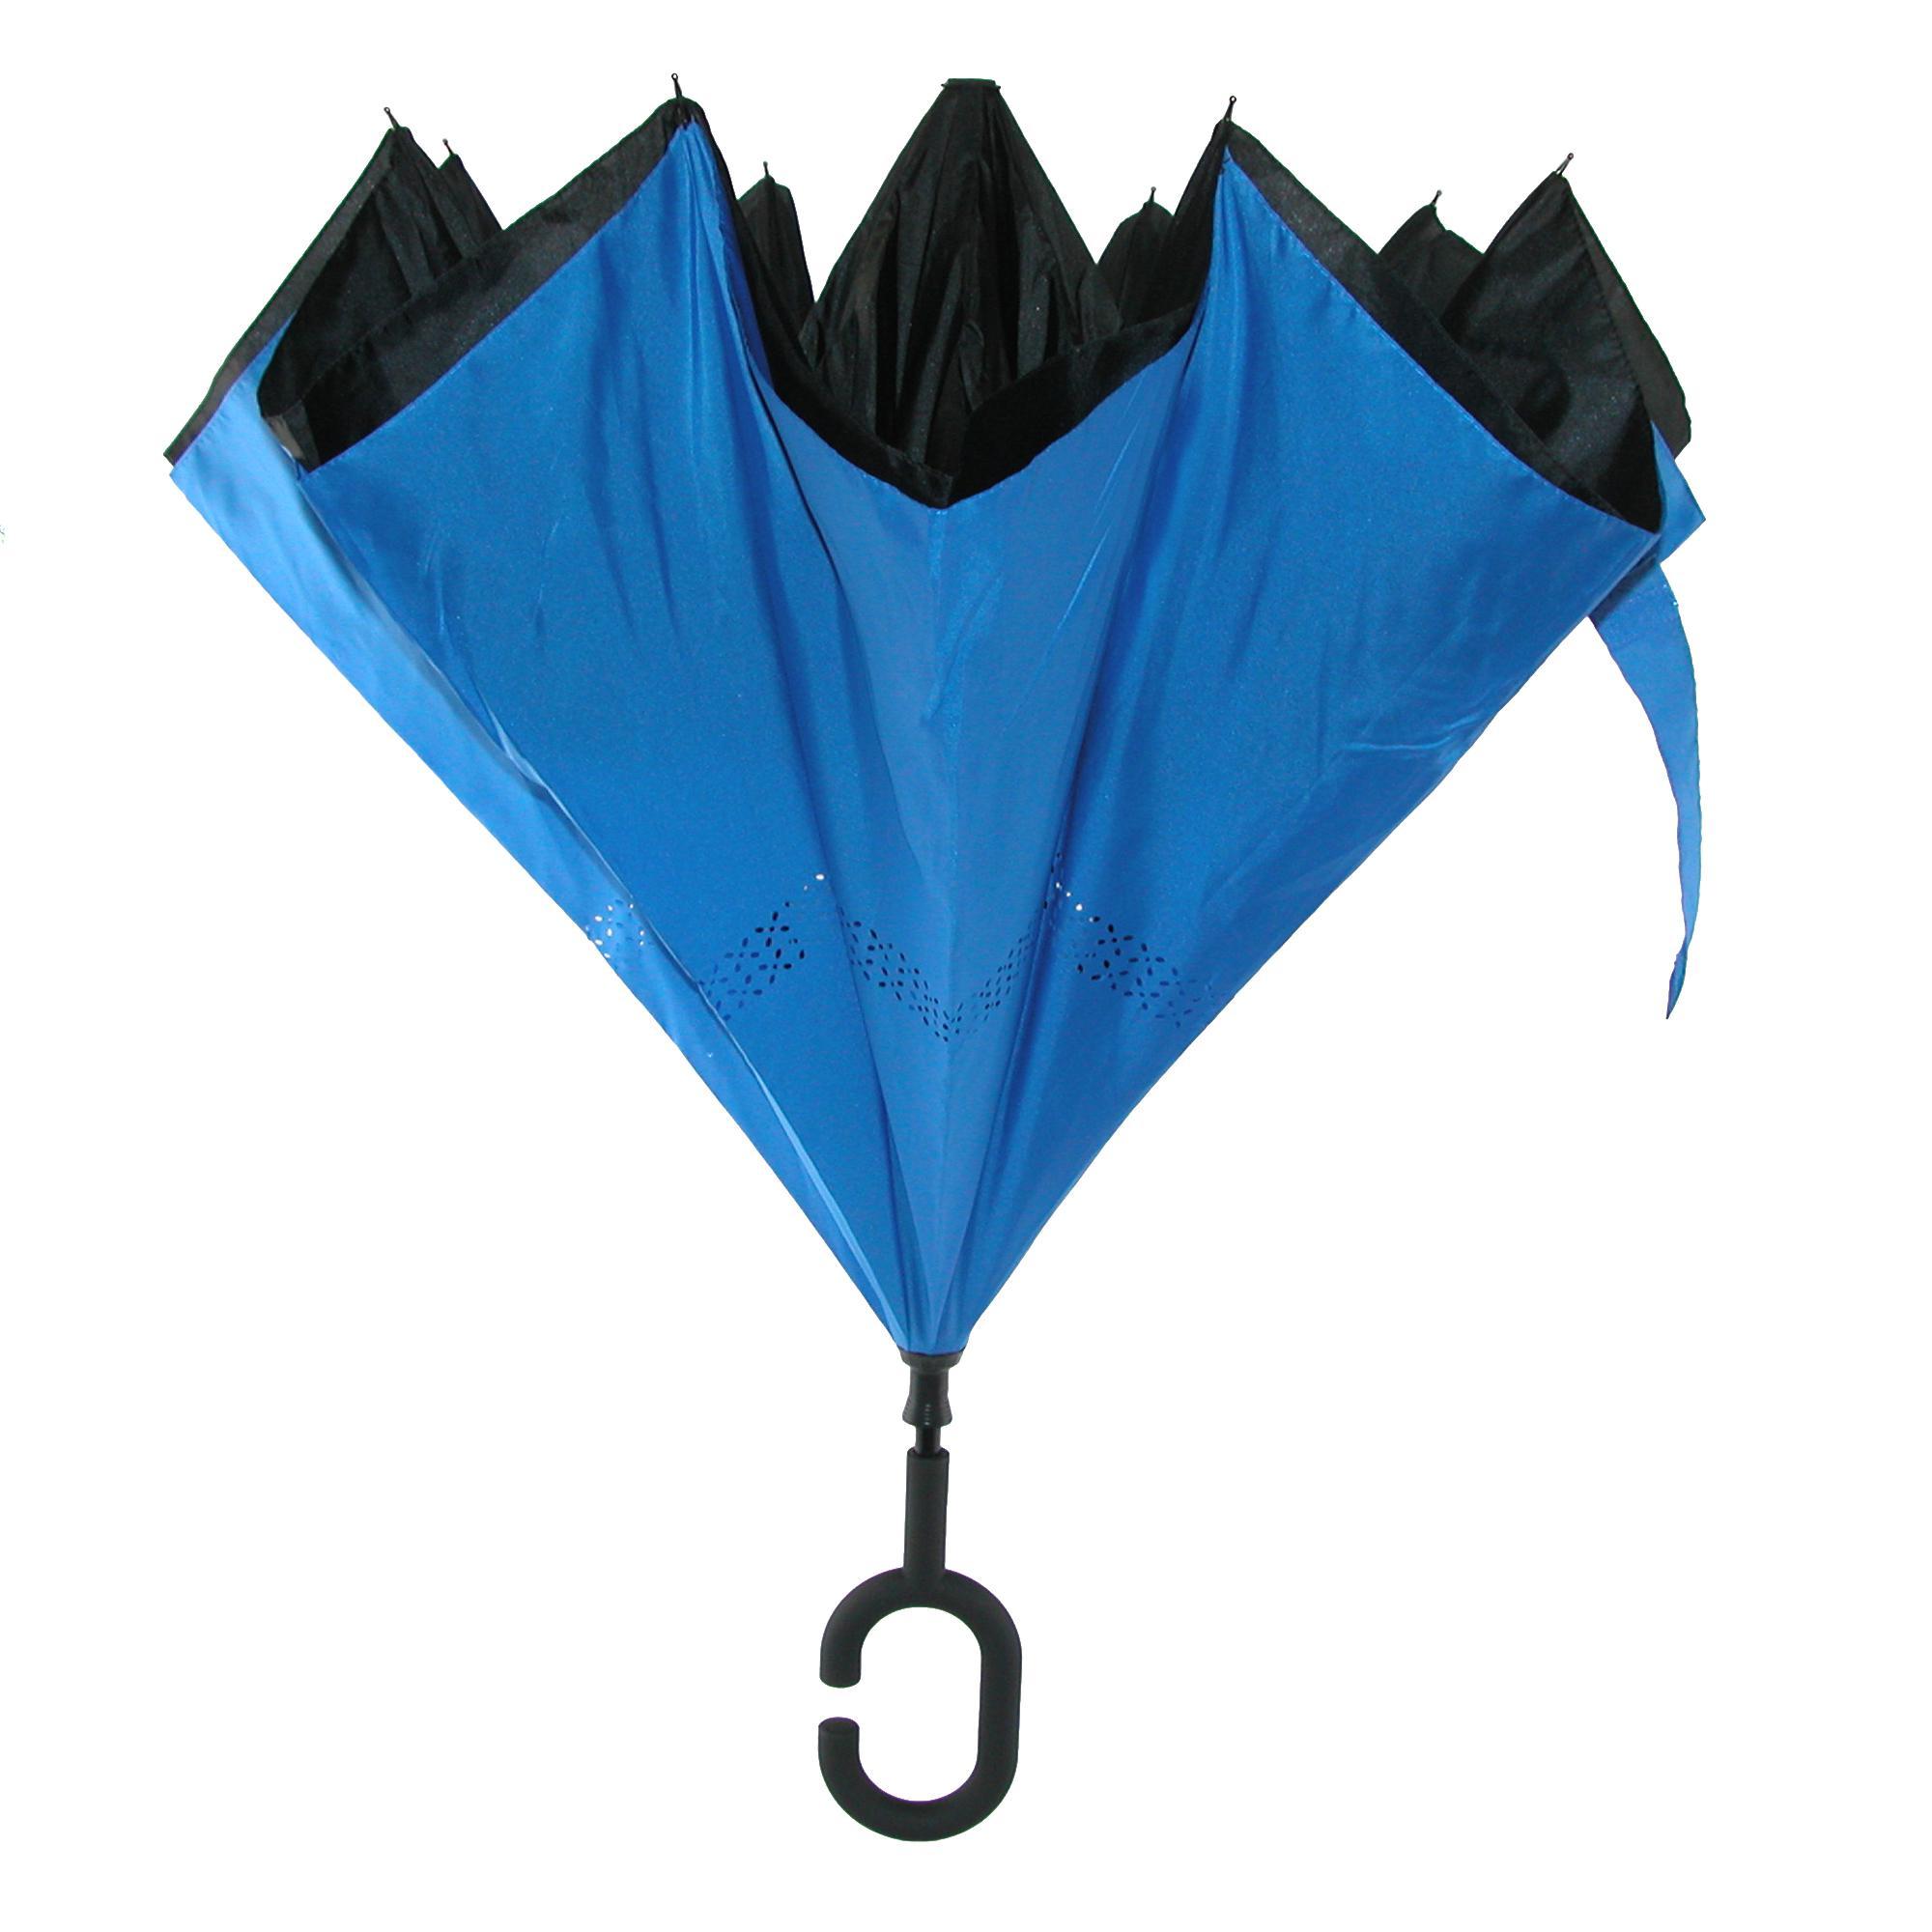 New ShedRain Reverse Closing UnbelievaBrella Stick Umbrella